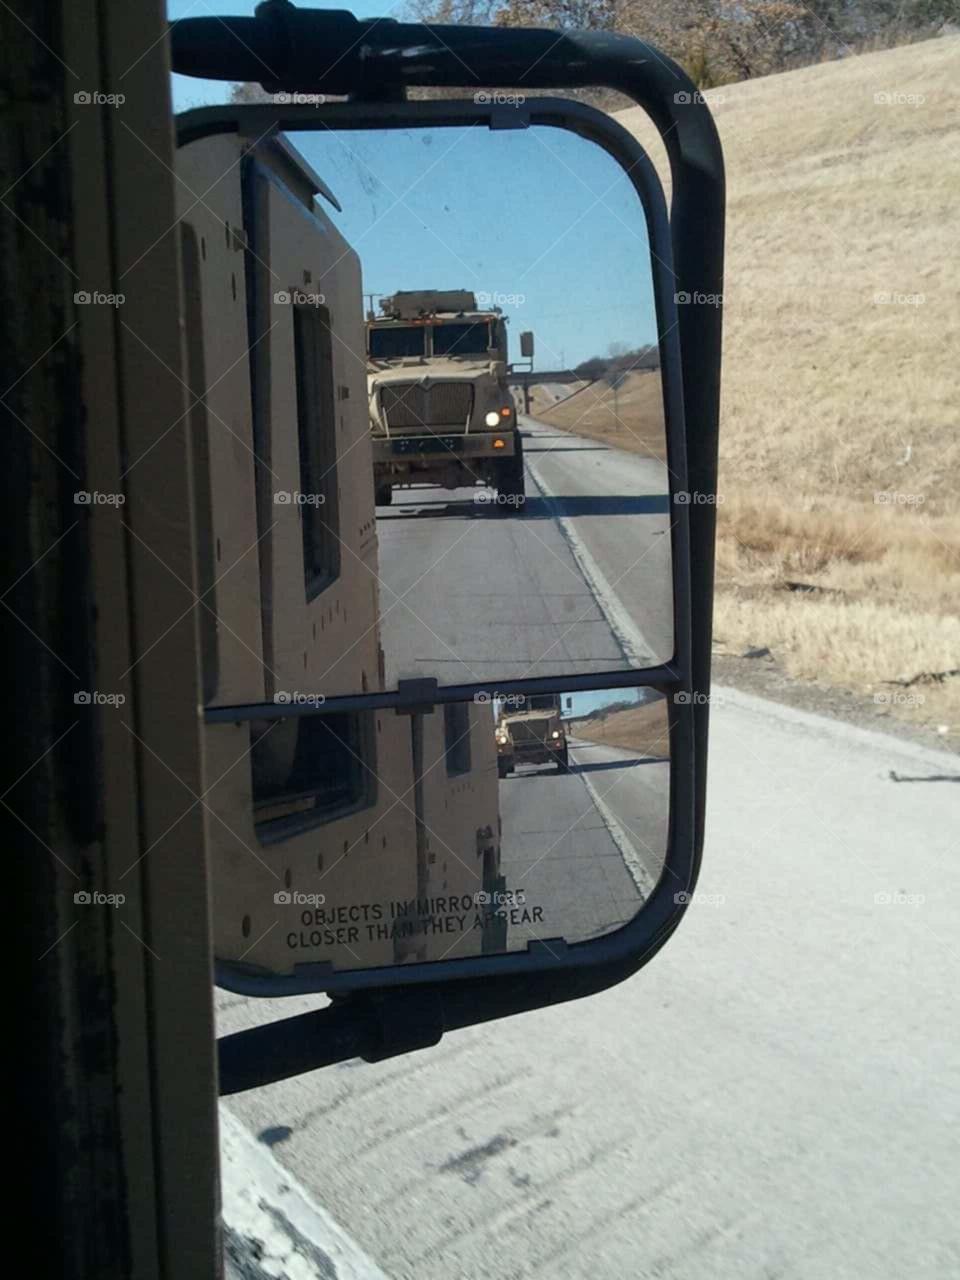 Military Hummer Reflection. mirror reflection of hummer humvee